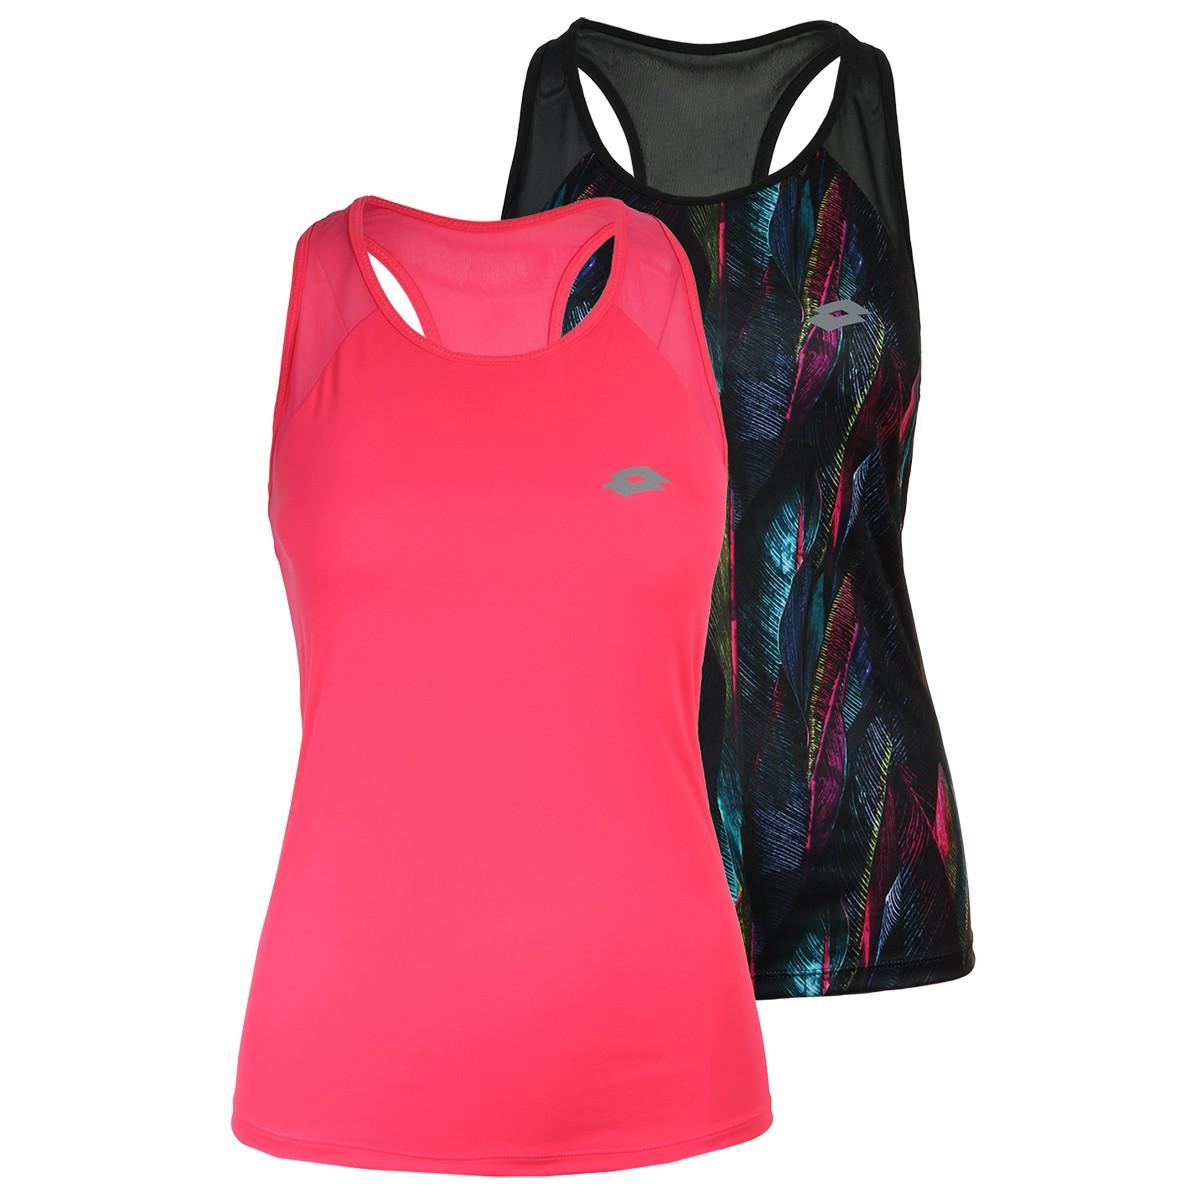 X Ii Camiseta De Lotto Fit Tennispro Tirantes pSptqxnA